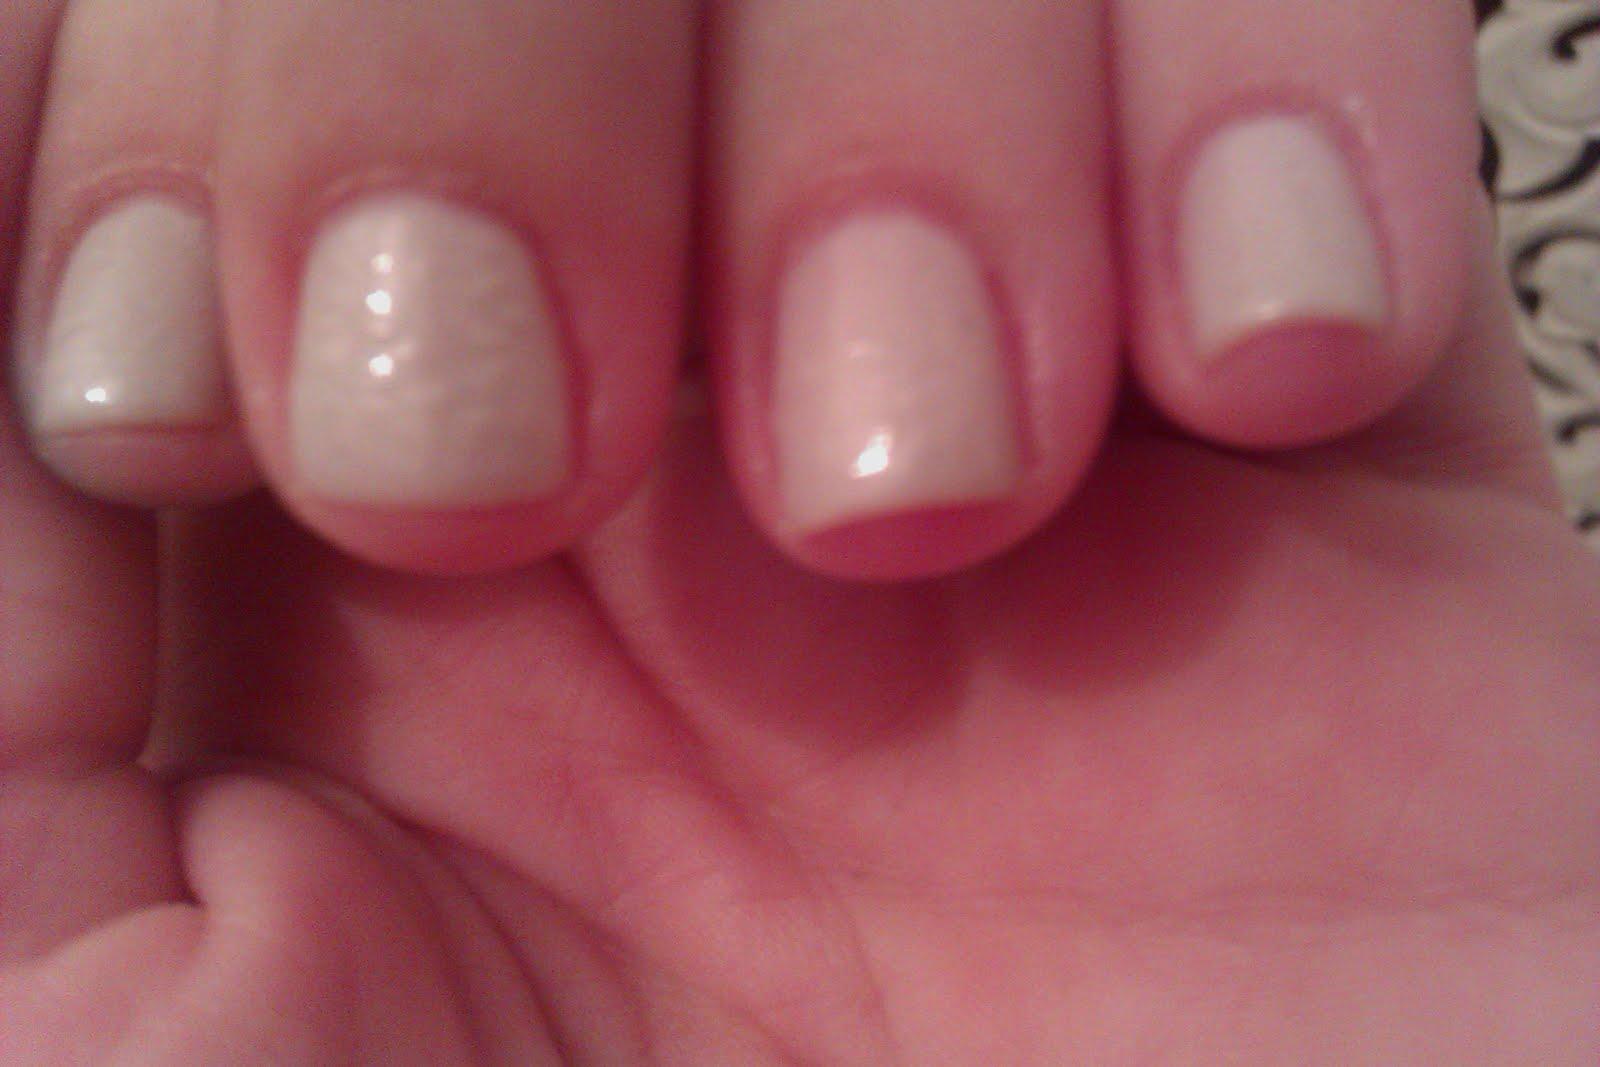 Me So Vain : No More Bubbles in My Nail Polish